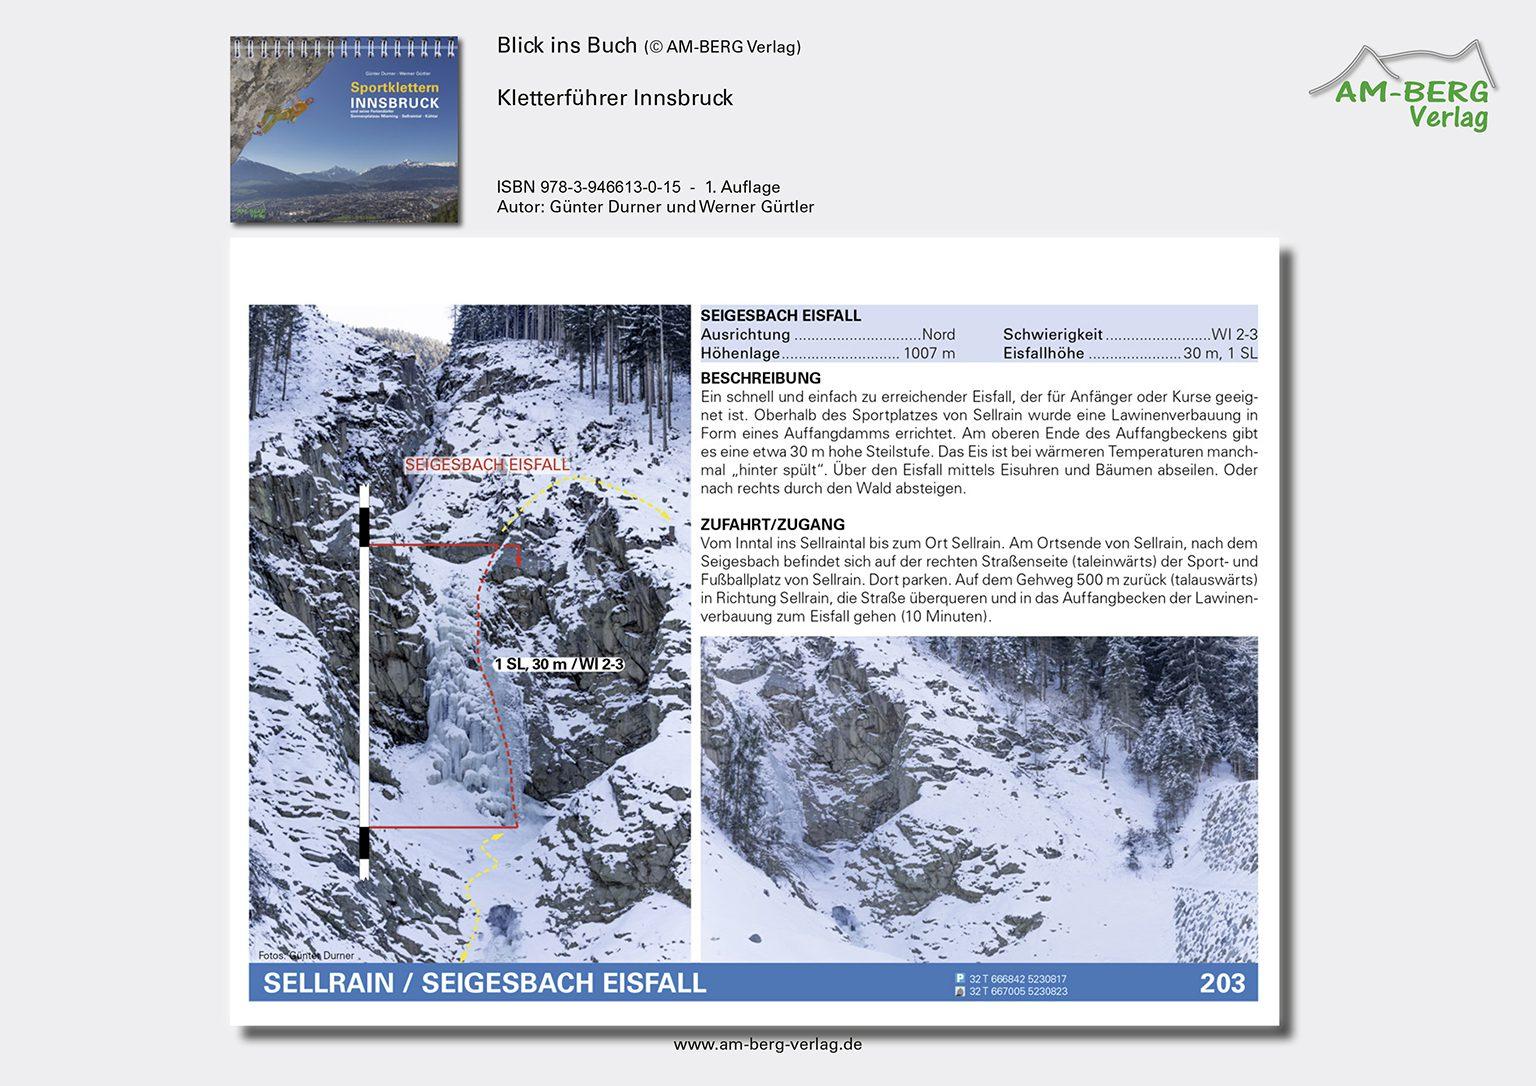 Sportklettern-Innsbruck-BlickinsBuch10_sellrain-seigesbach-Eisfall